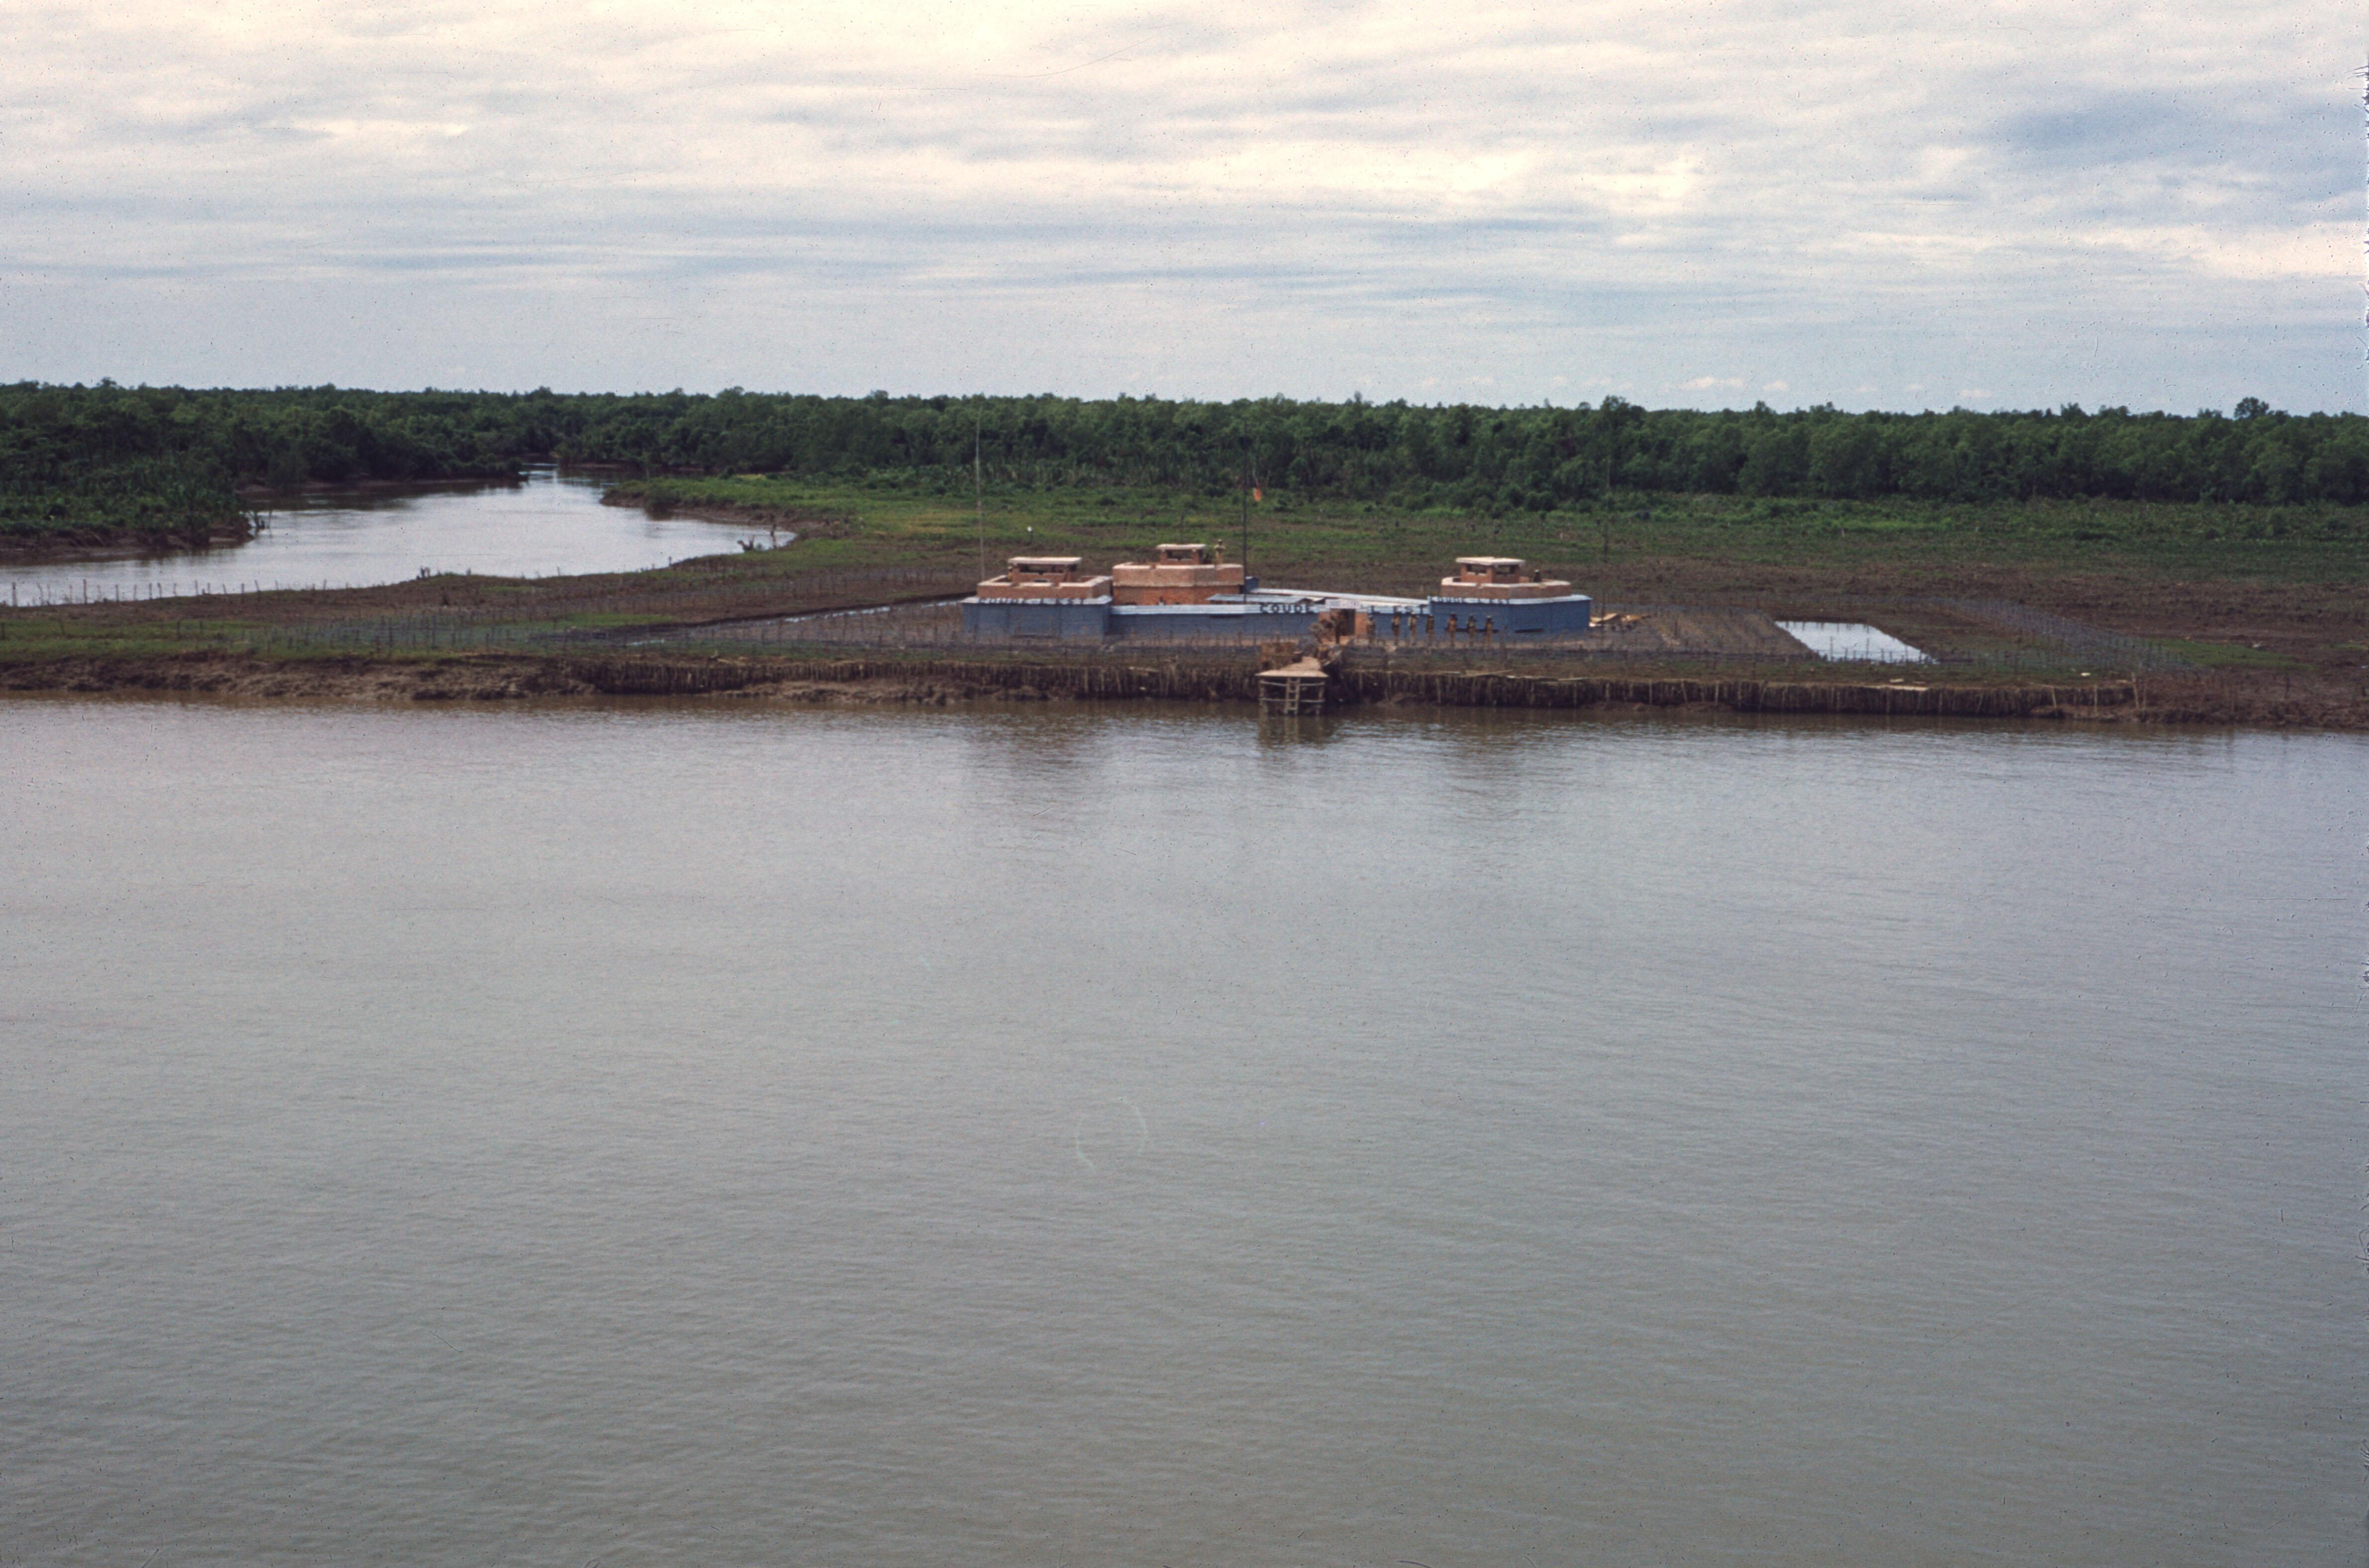 Река Сайгон. Французский форт